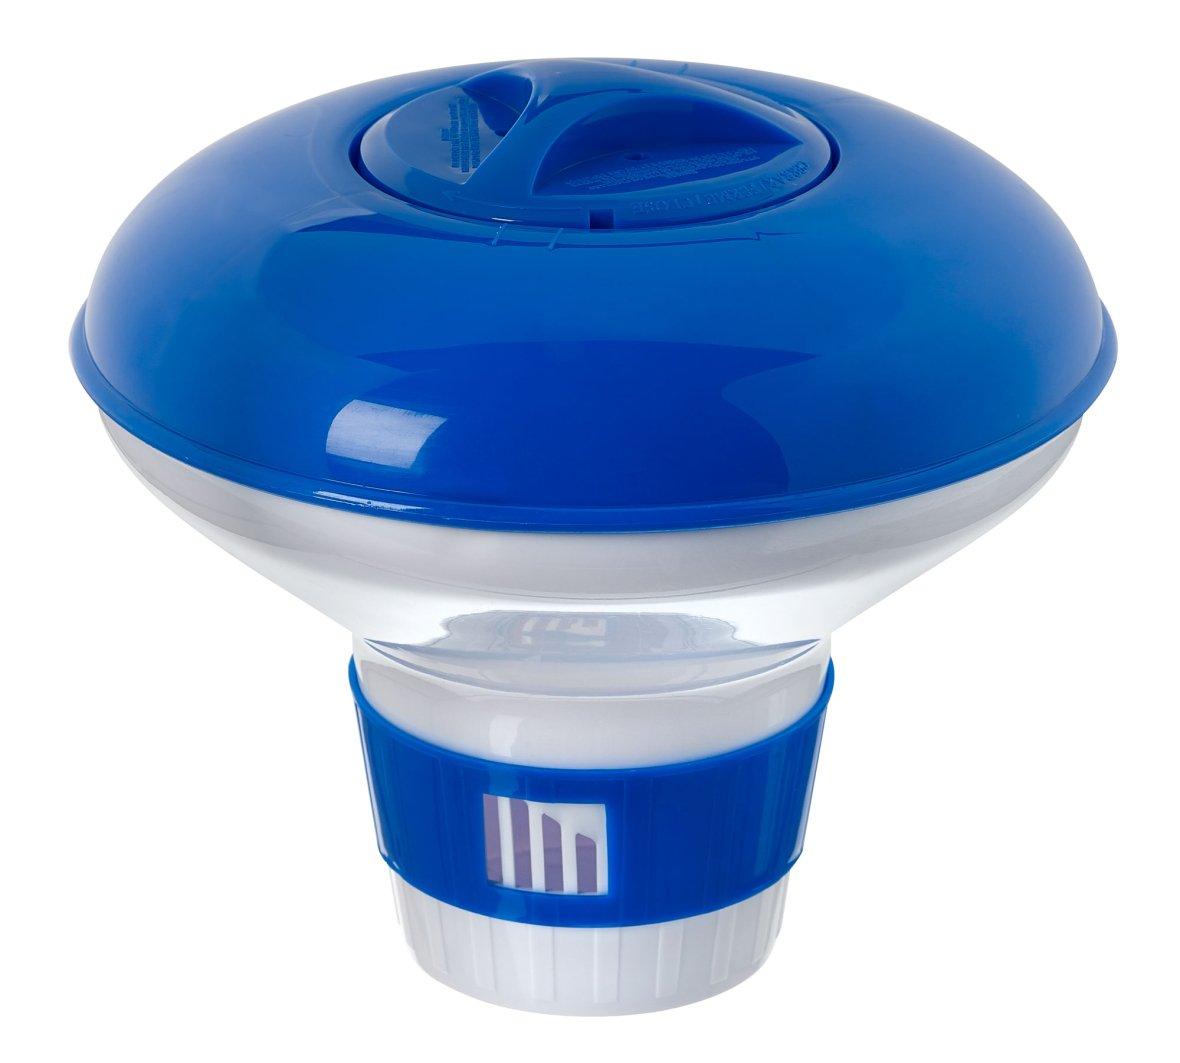 Spa chlorine floating dispenser